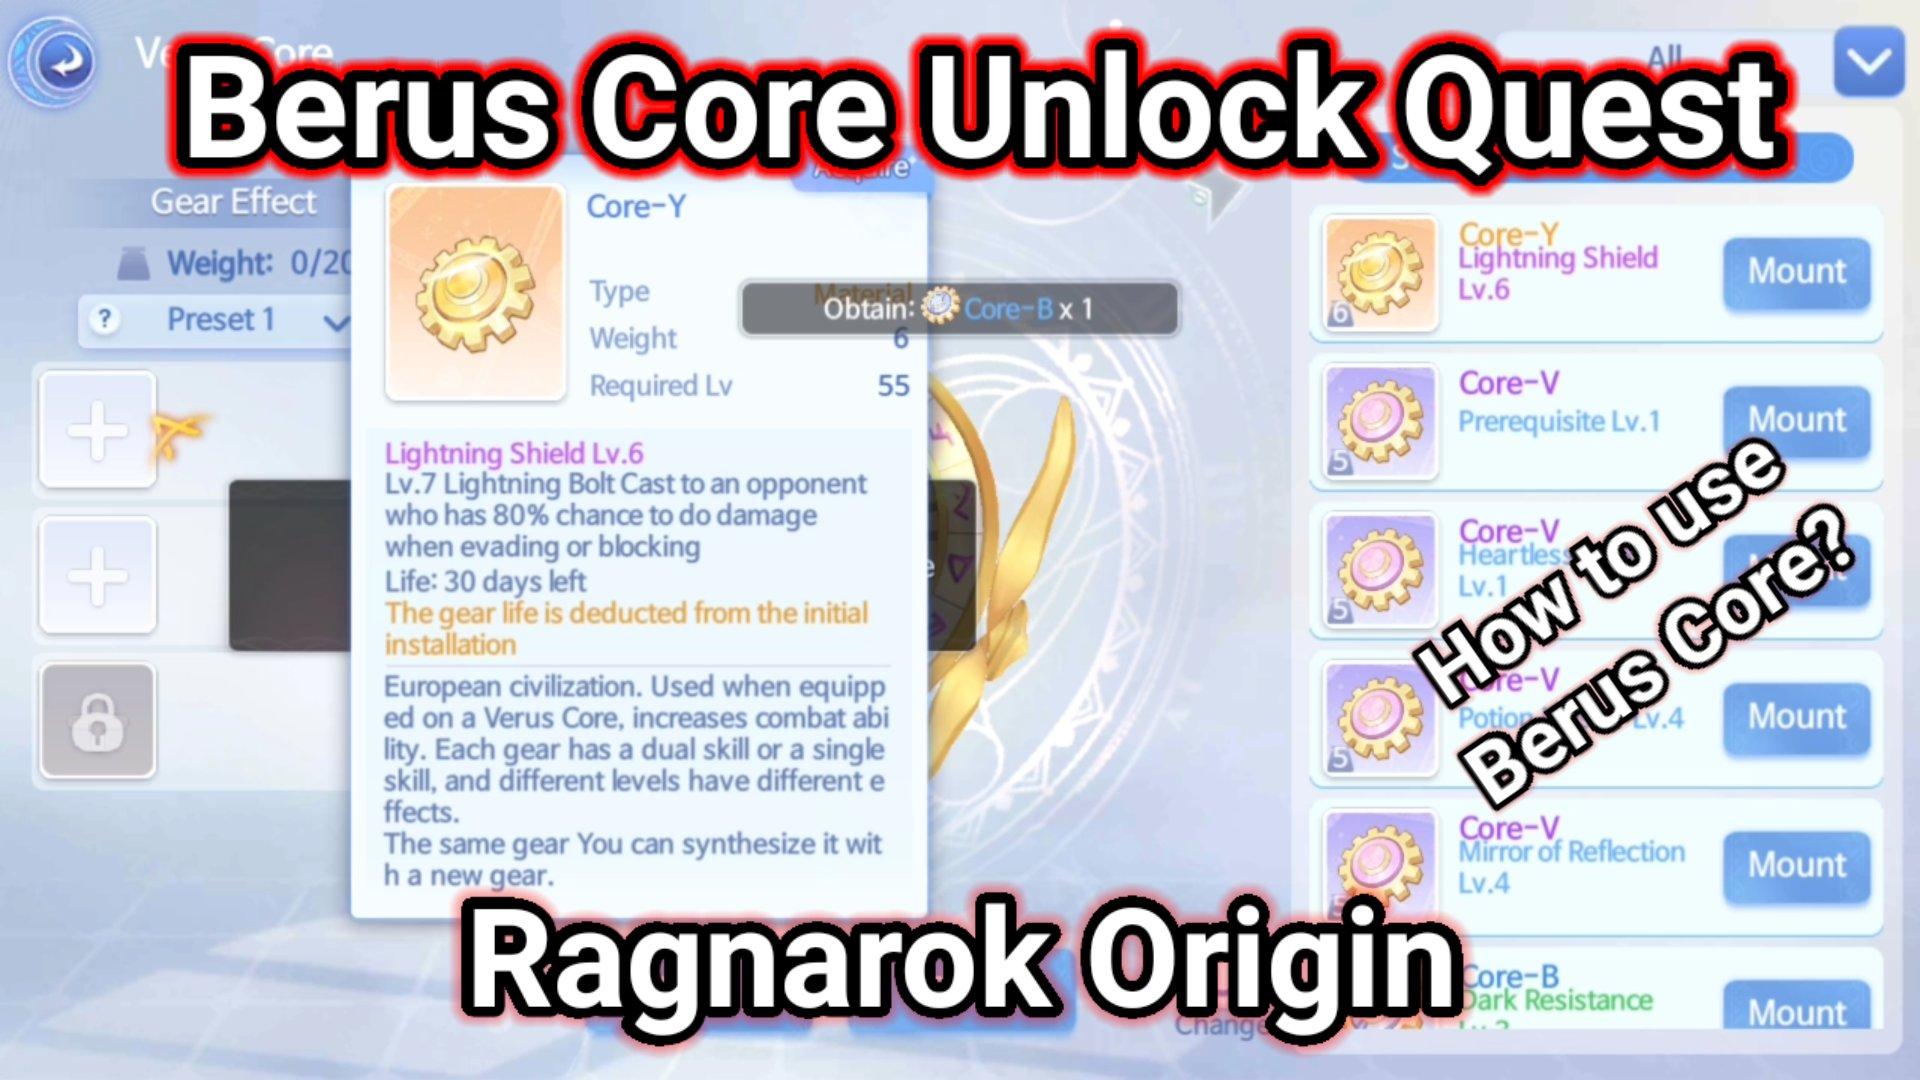 Berus core ragnarok origin